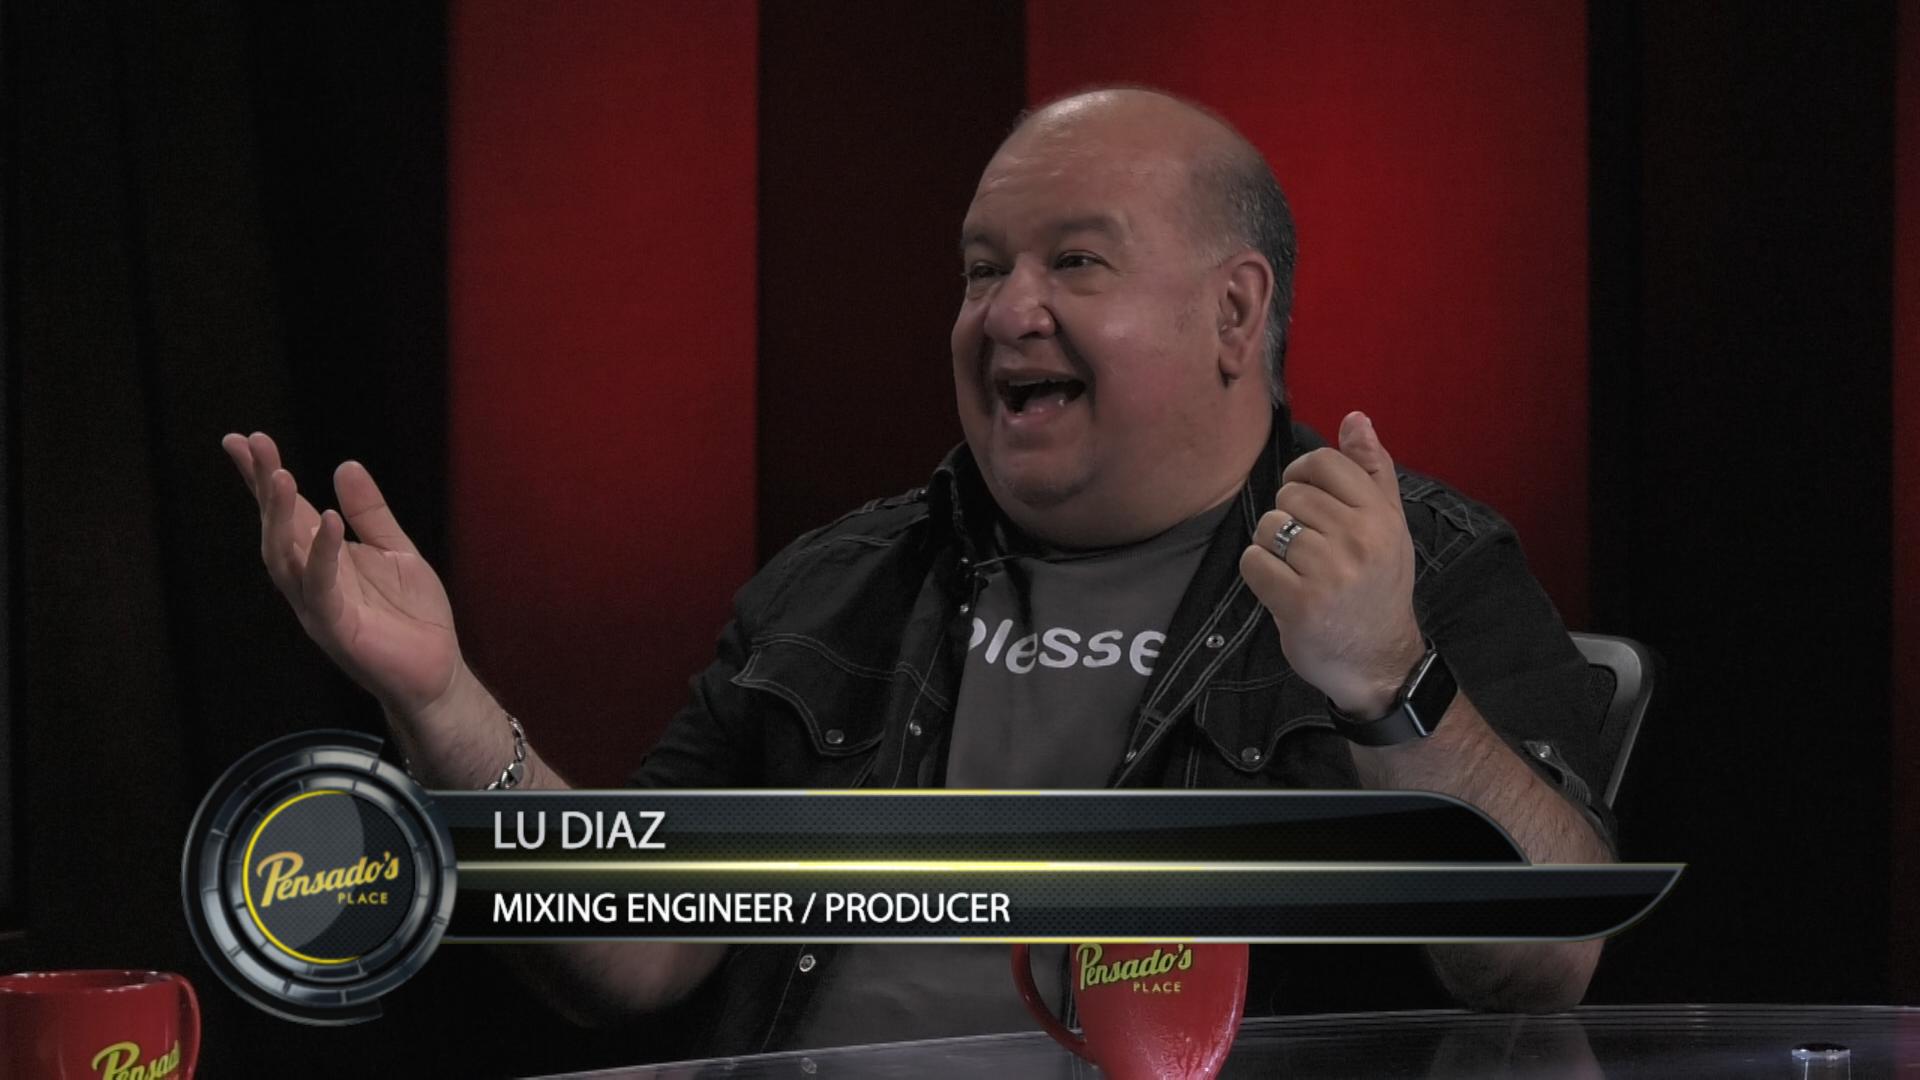 Sill Frame - E285 - Lu Diaz